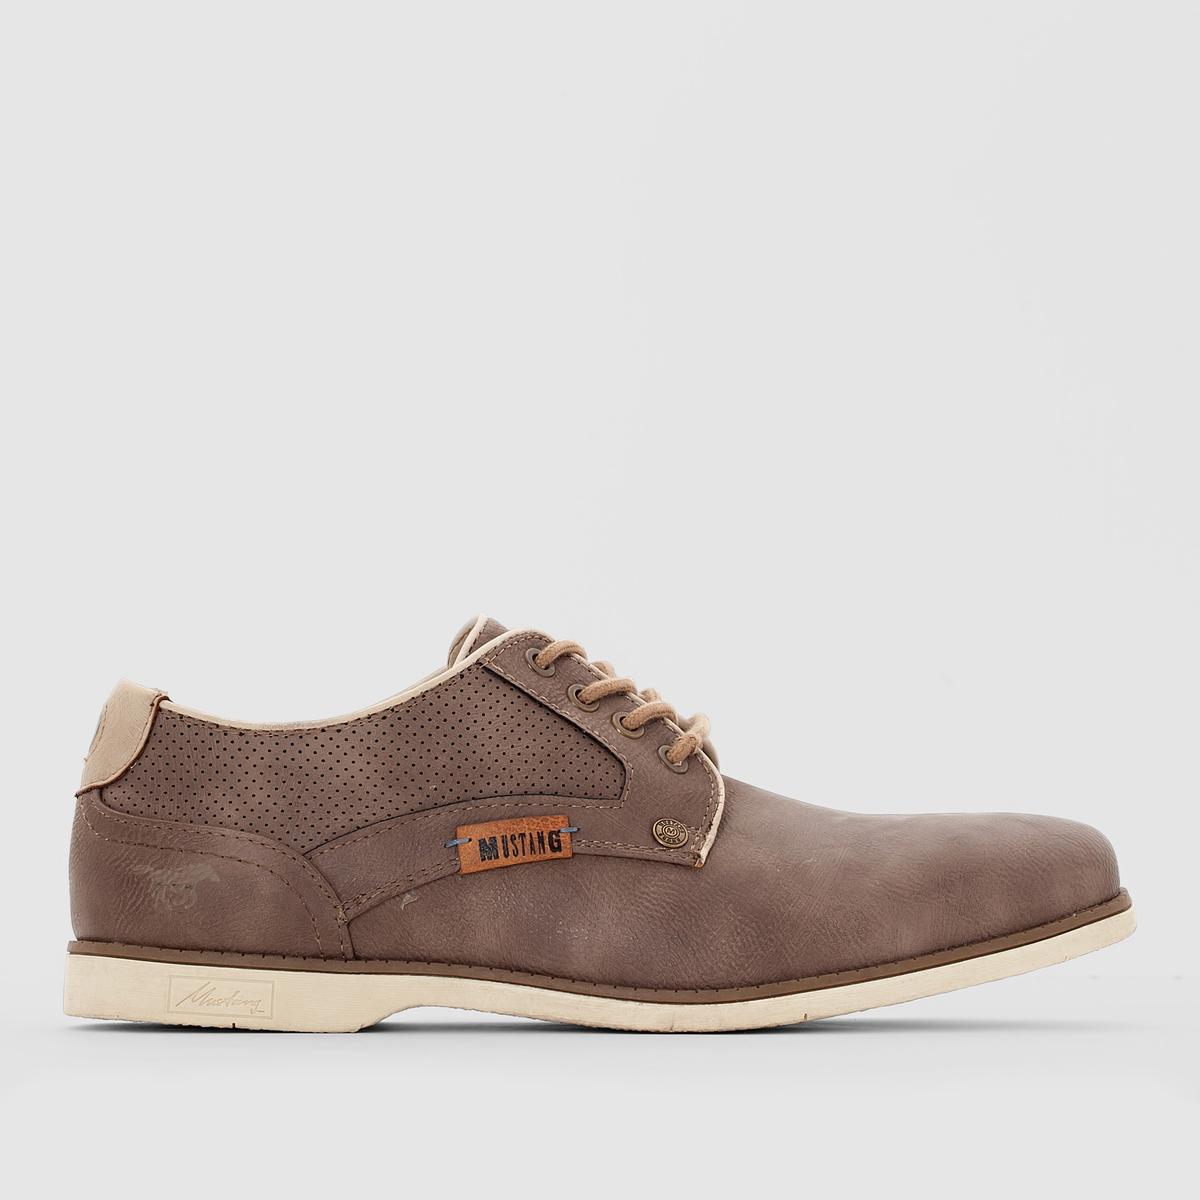 MUSTANG SHOES Ботинки-дерби на шнуровке